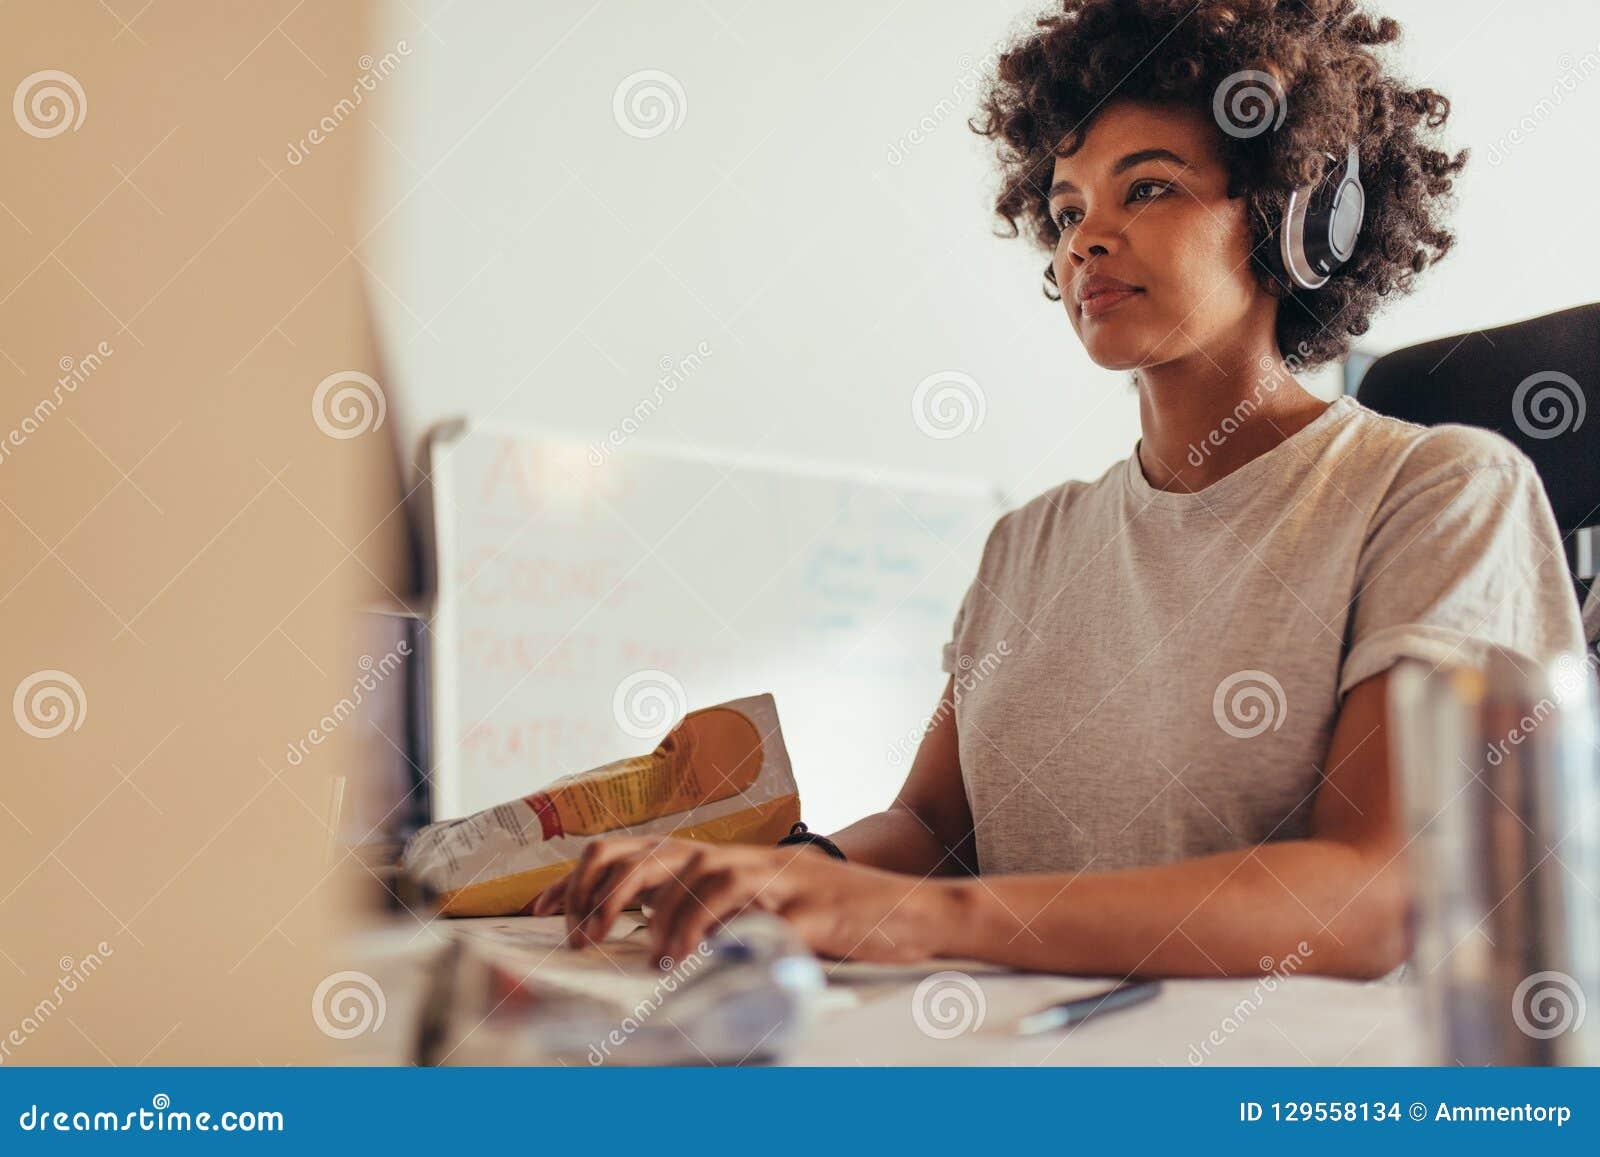 Female programmer typing data codes